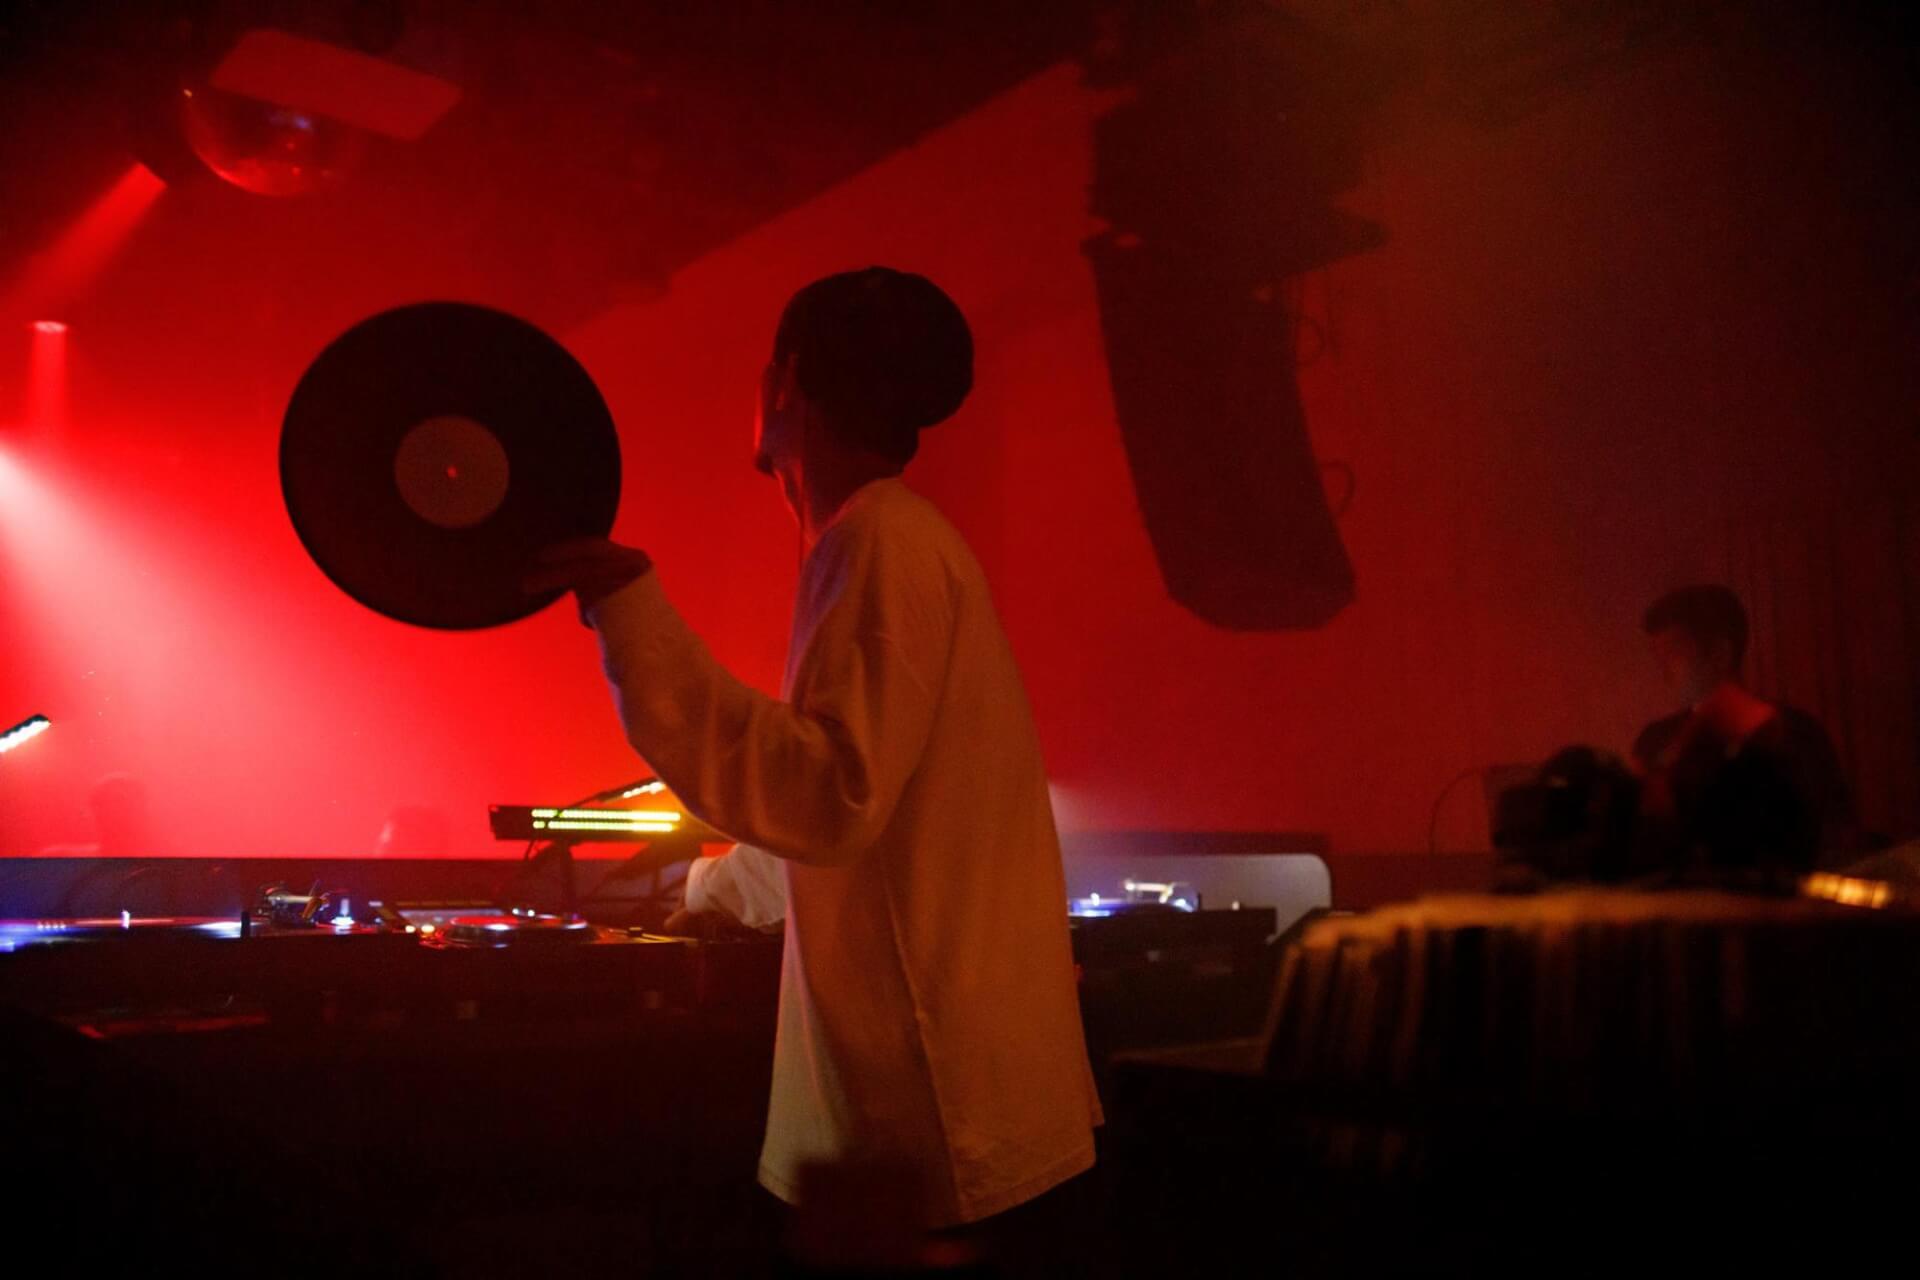 Floating Points at KEWL 2nd Anniversary Party。ダンスミュージックへの初期衝動を想い返した夜 music200116-kewl-floating-points-14